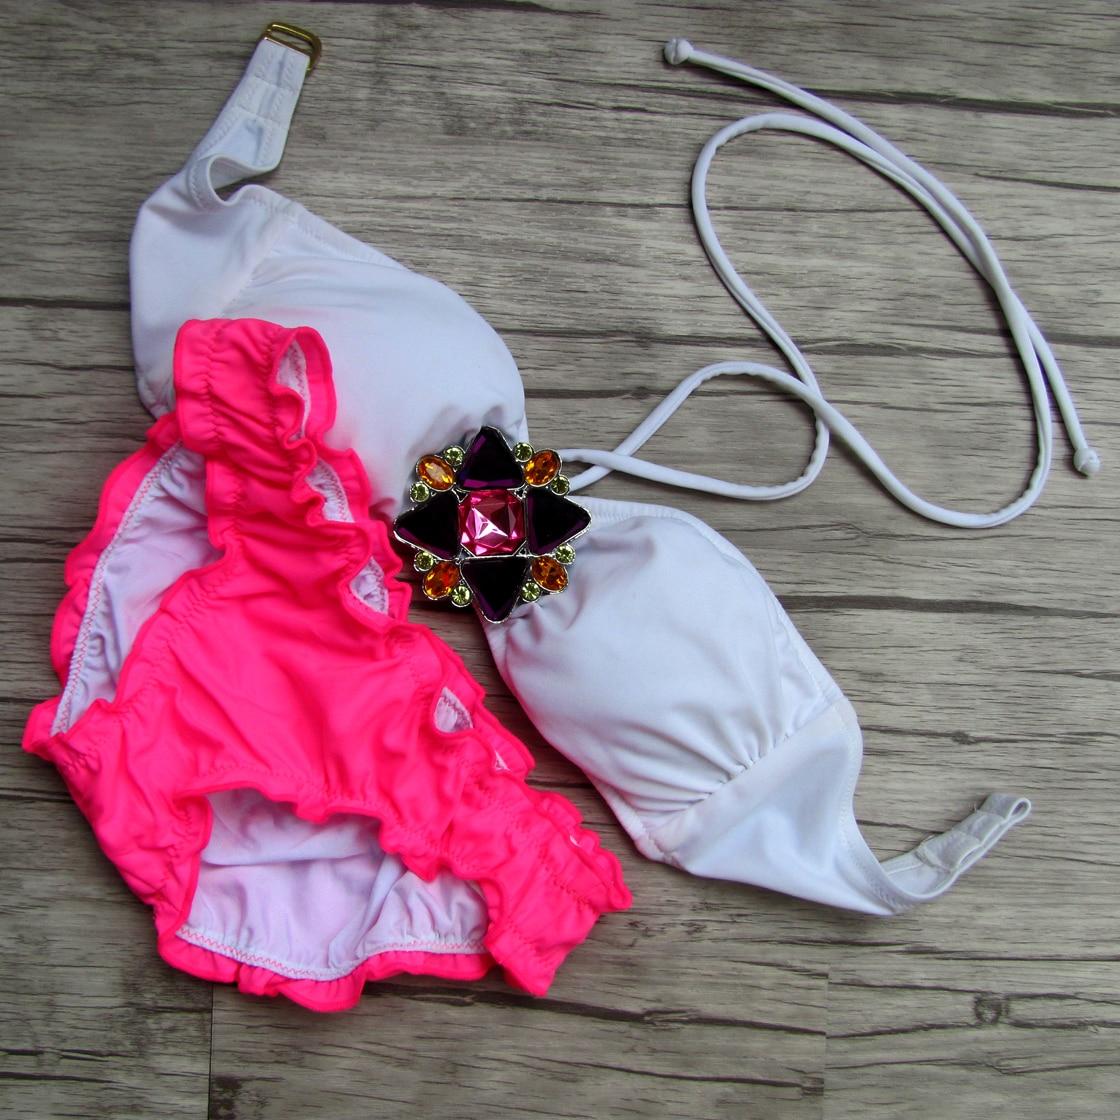 Designs Secret Crystal Diamond Bikini Set White Swimwear Women Swimsuit 2017 Biquini Pink Bottom Bathing Suit Custom Made<br><br>Aliexpress